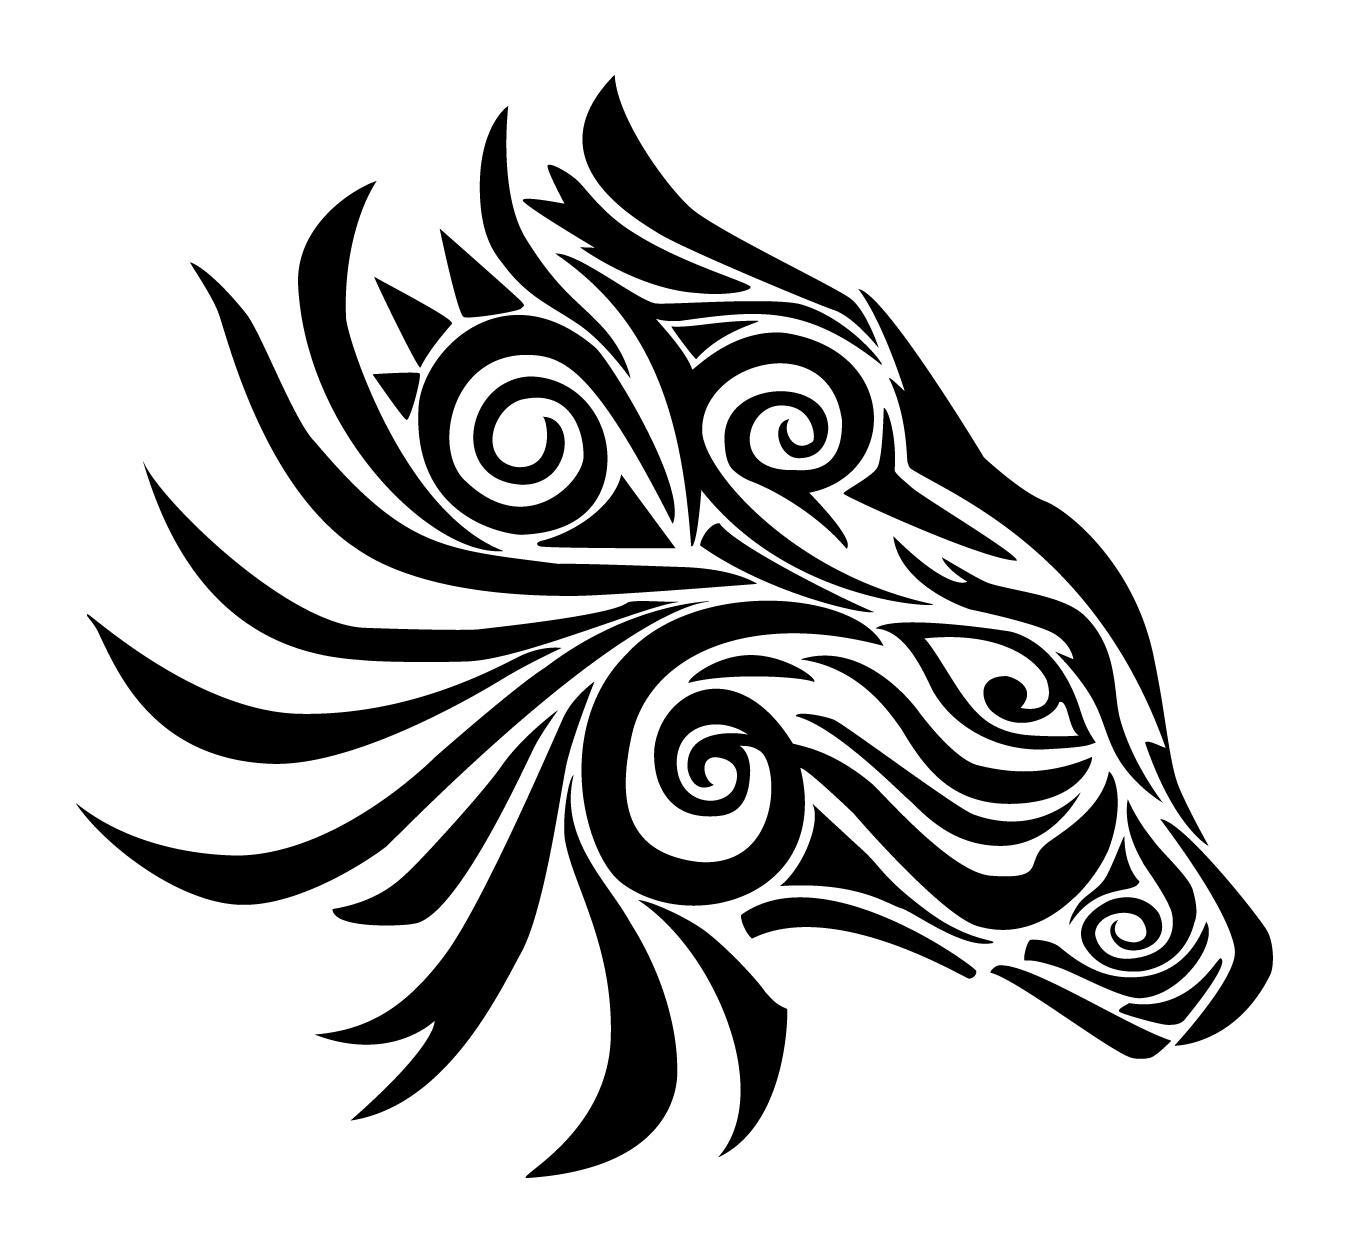 Tatouage Designs Free Shipping Code